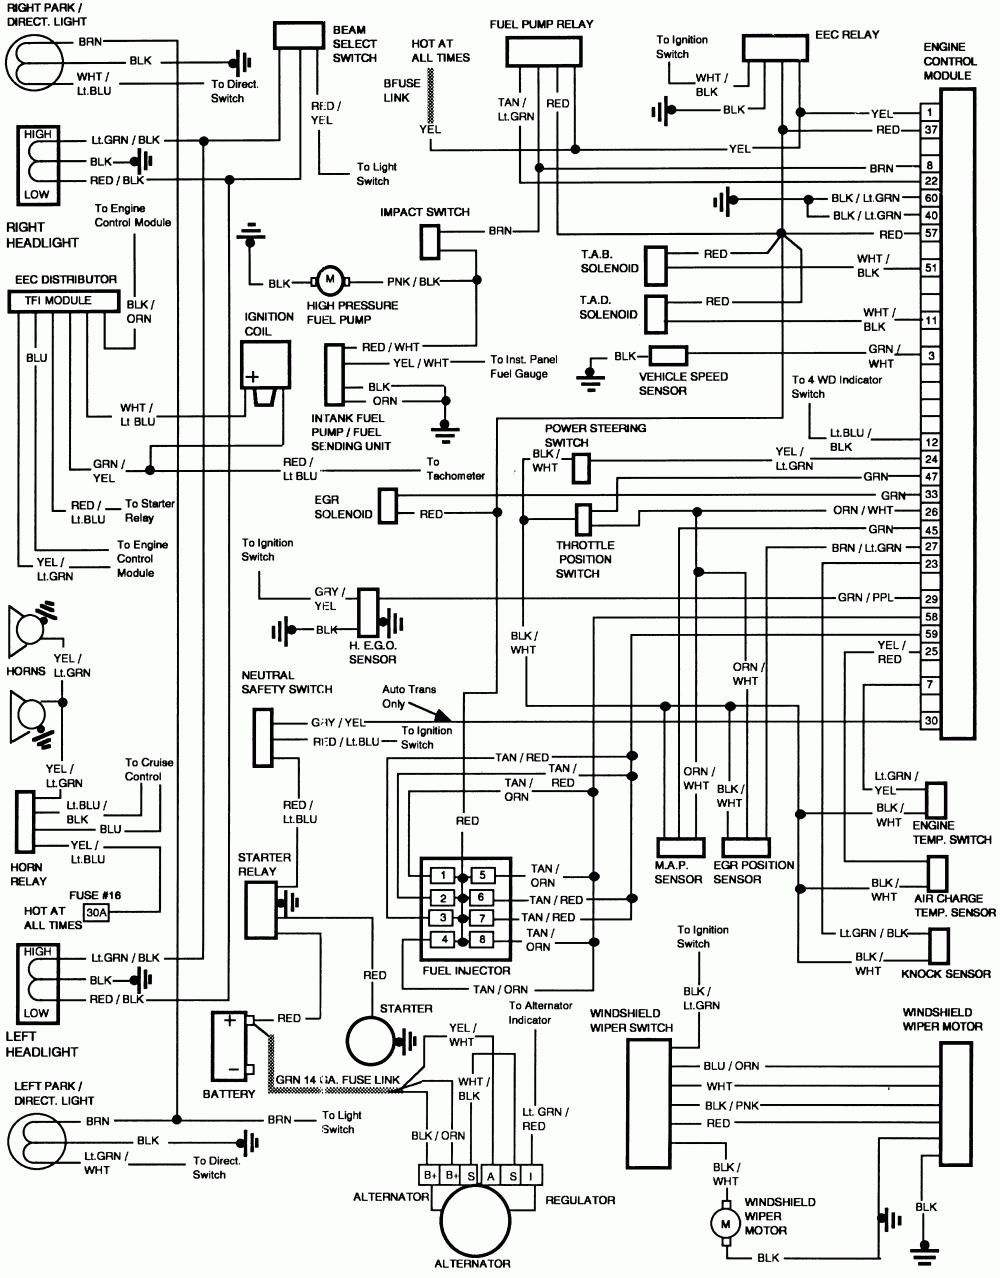 hight resolution of 1986 ford f150 radio wiring diagram 1986 ford f150 engine wiring diagram wire center u2022